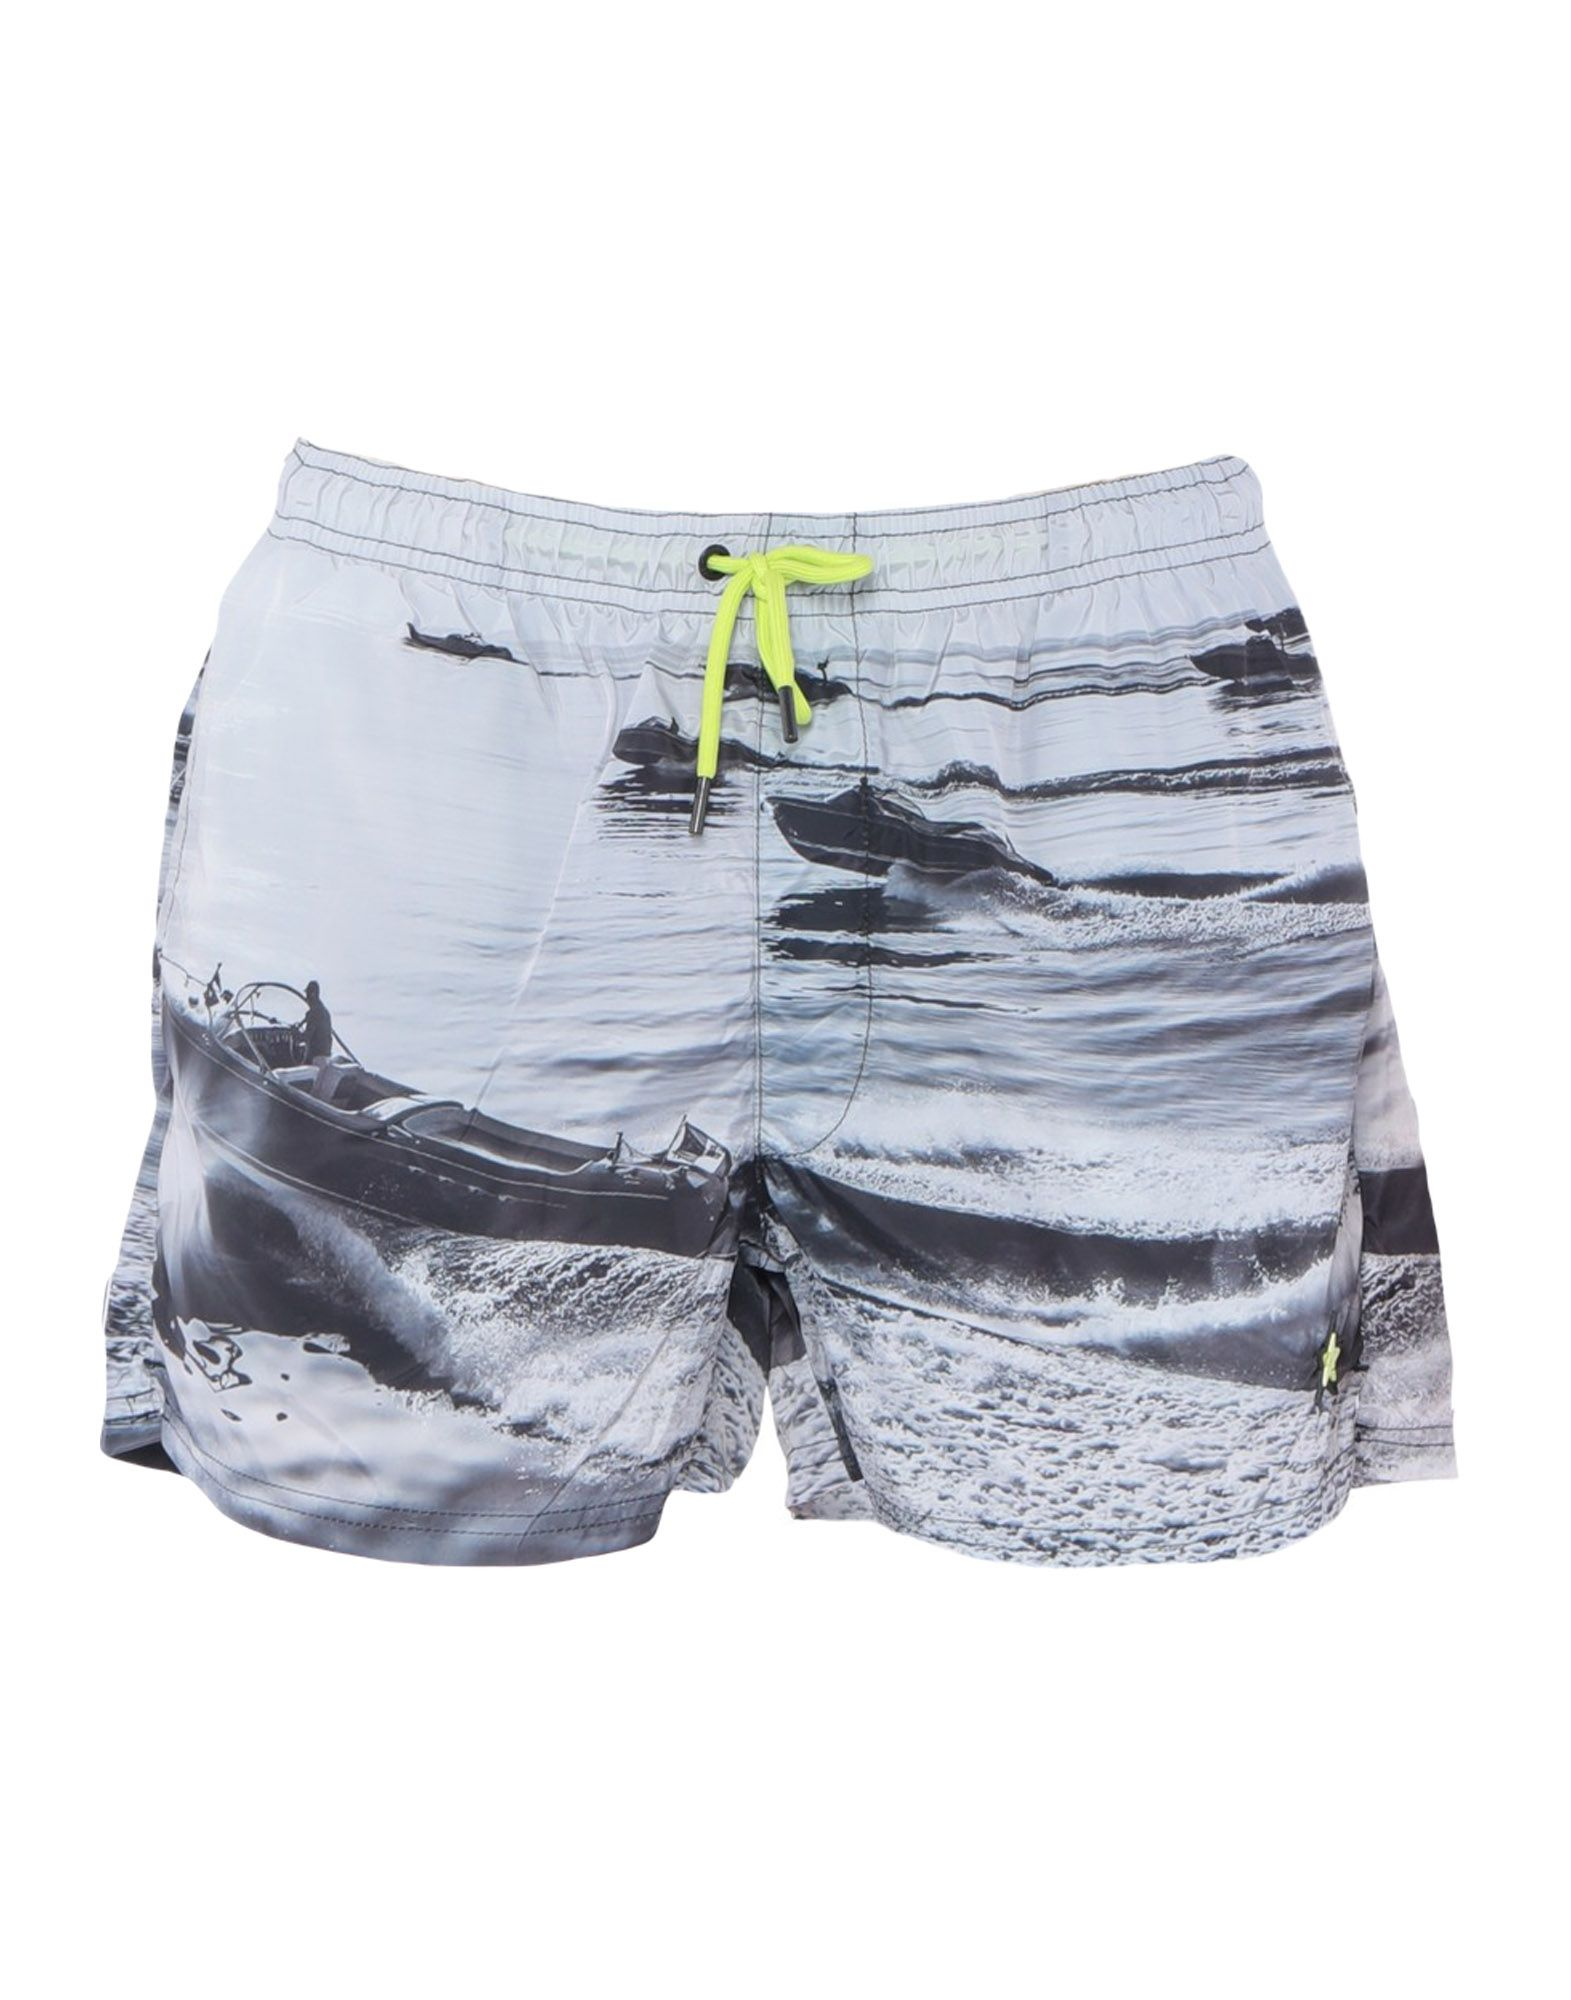 4GIVENESS Шорты для плавания шорты для плавания с принтом scene volley